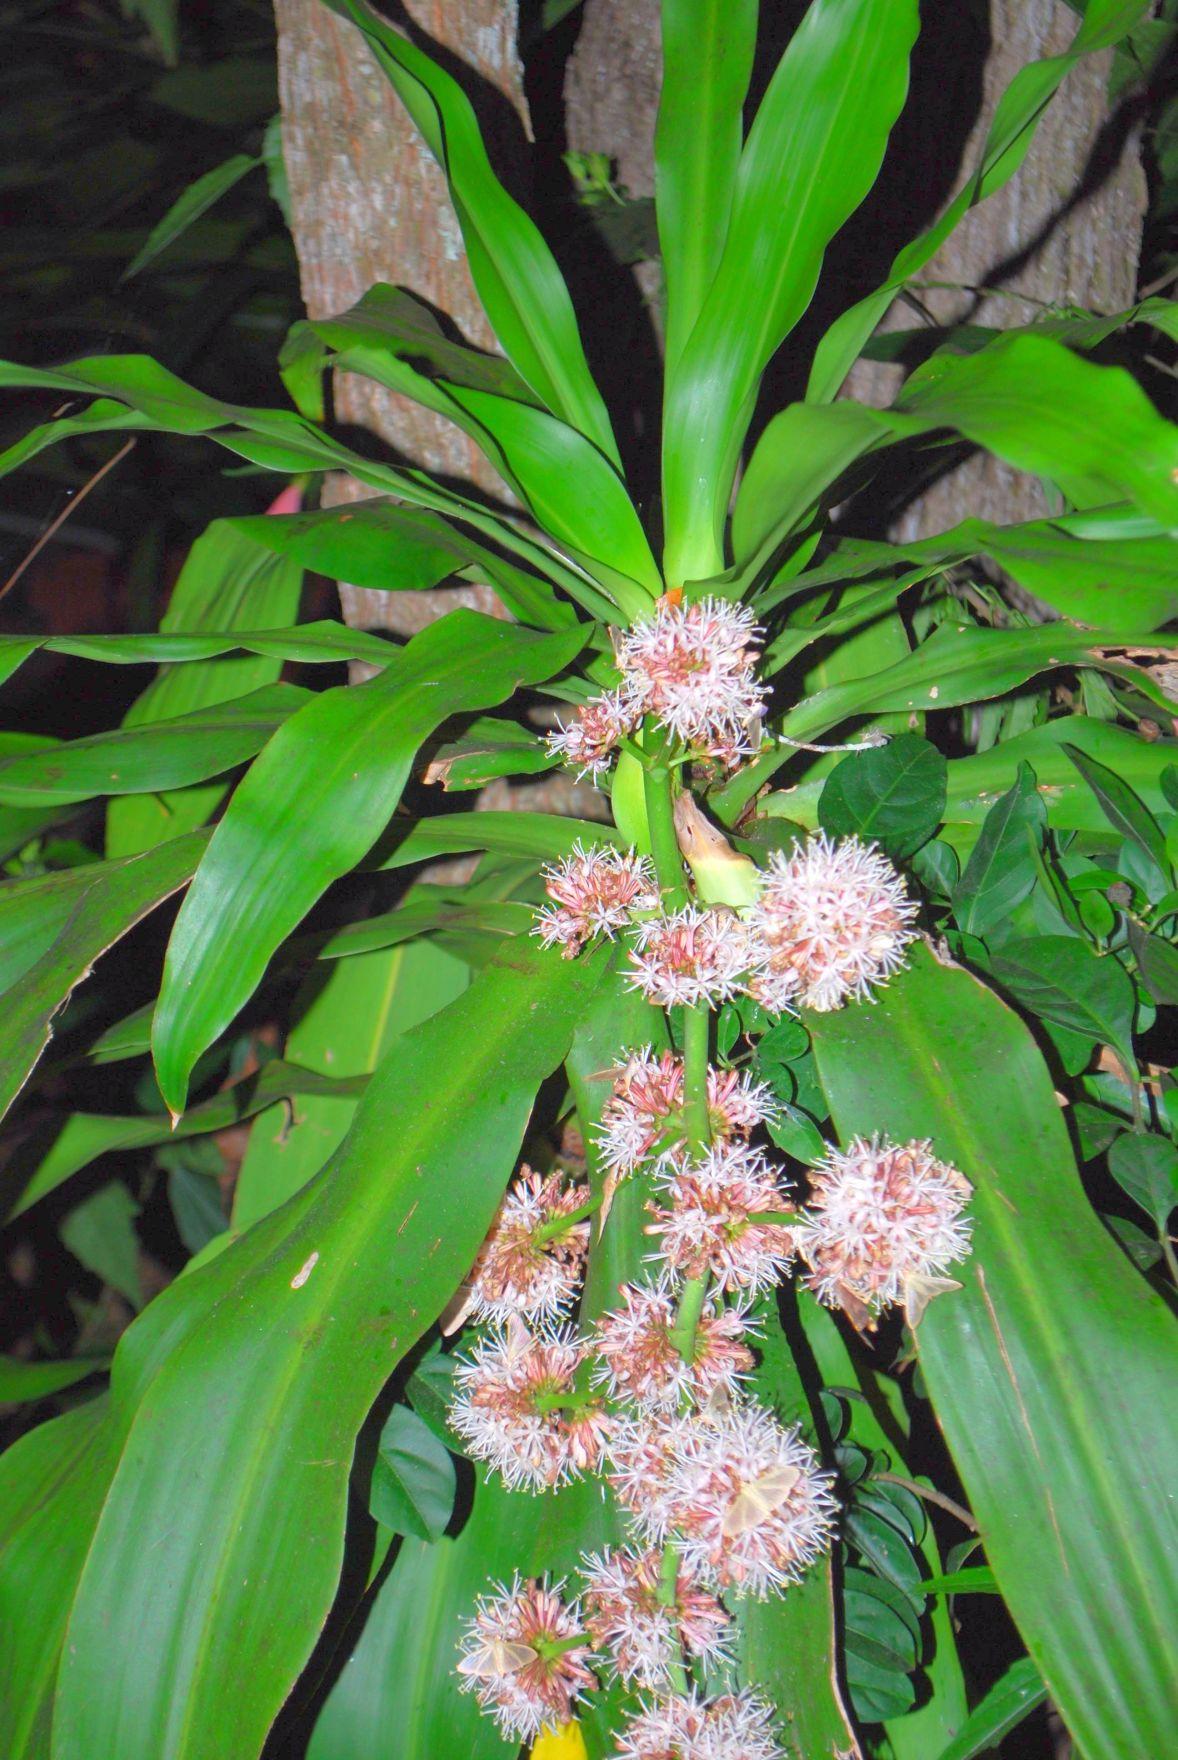 Corn plant - Dracaena fragrans